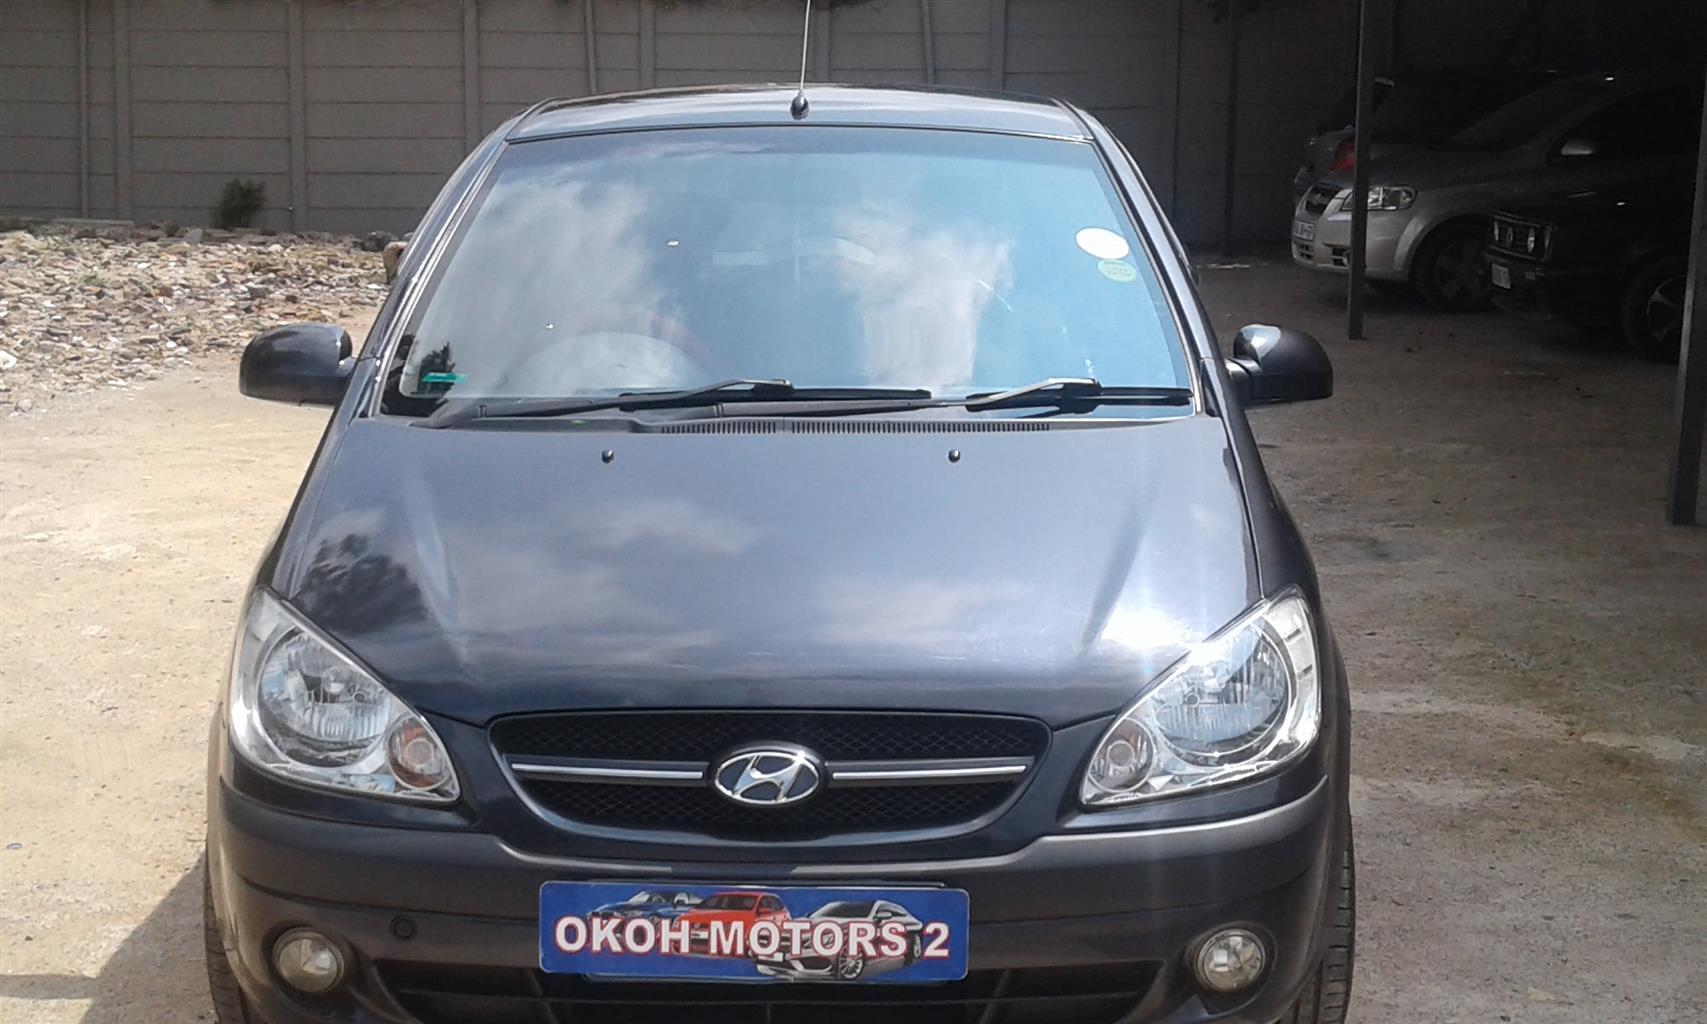 2010 Hyundai Getz 1.6 GL high spec